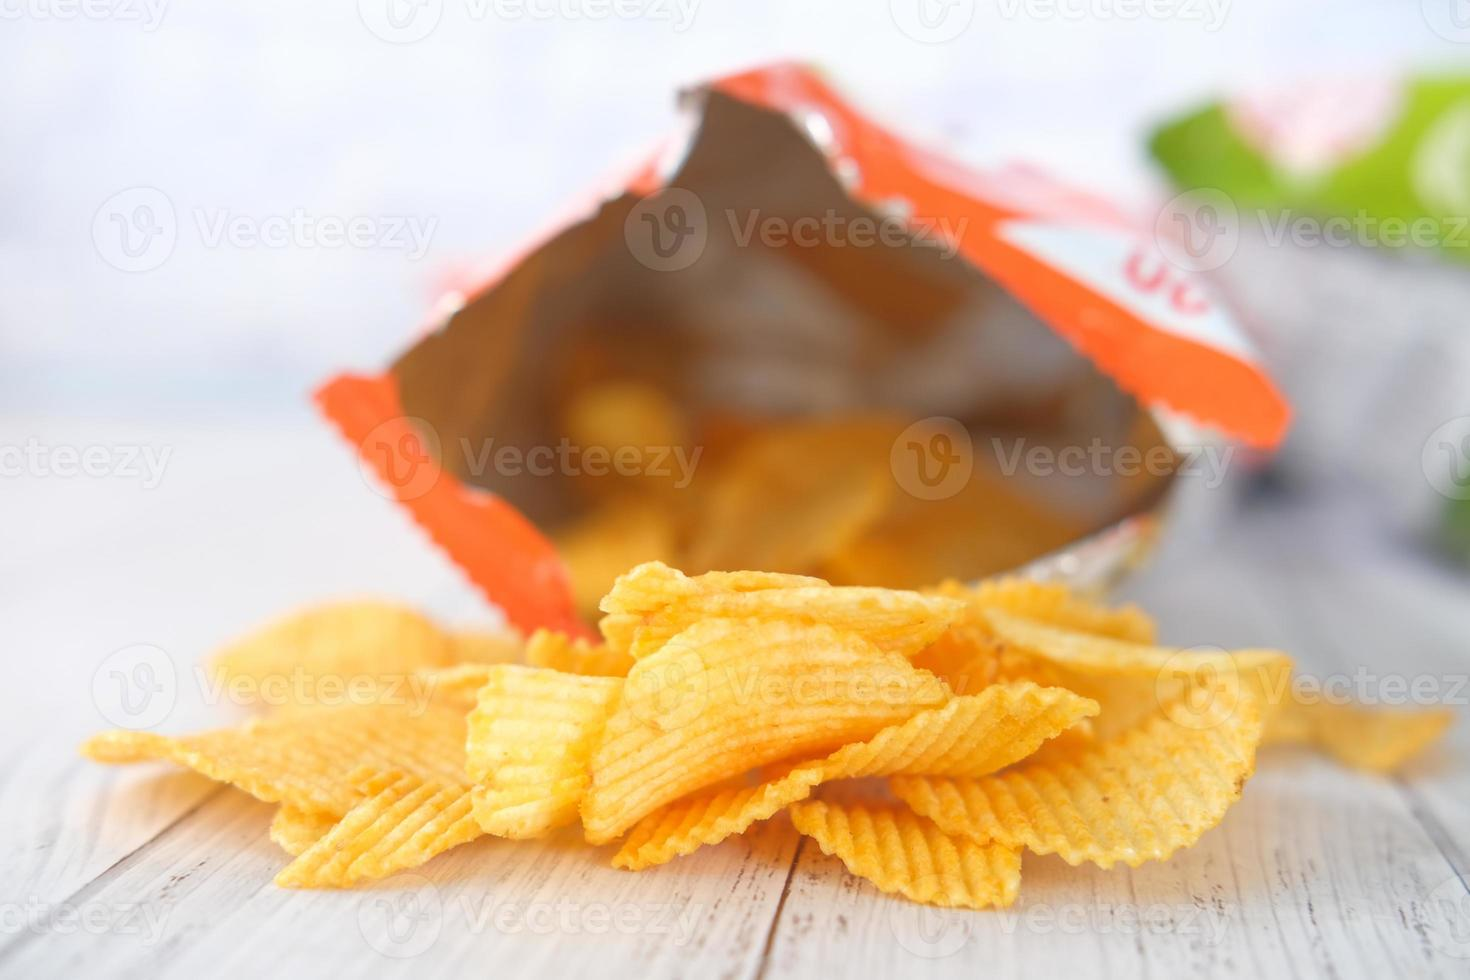 potatischips i orange påse foto